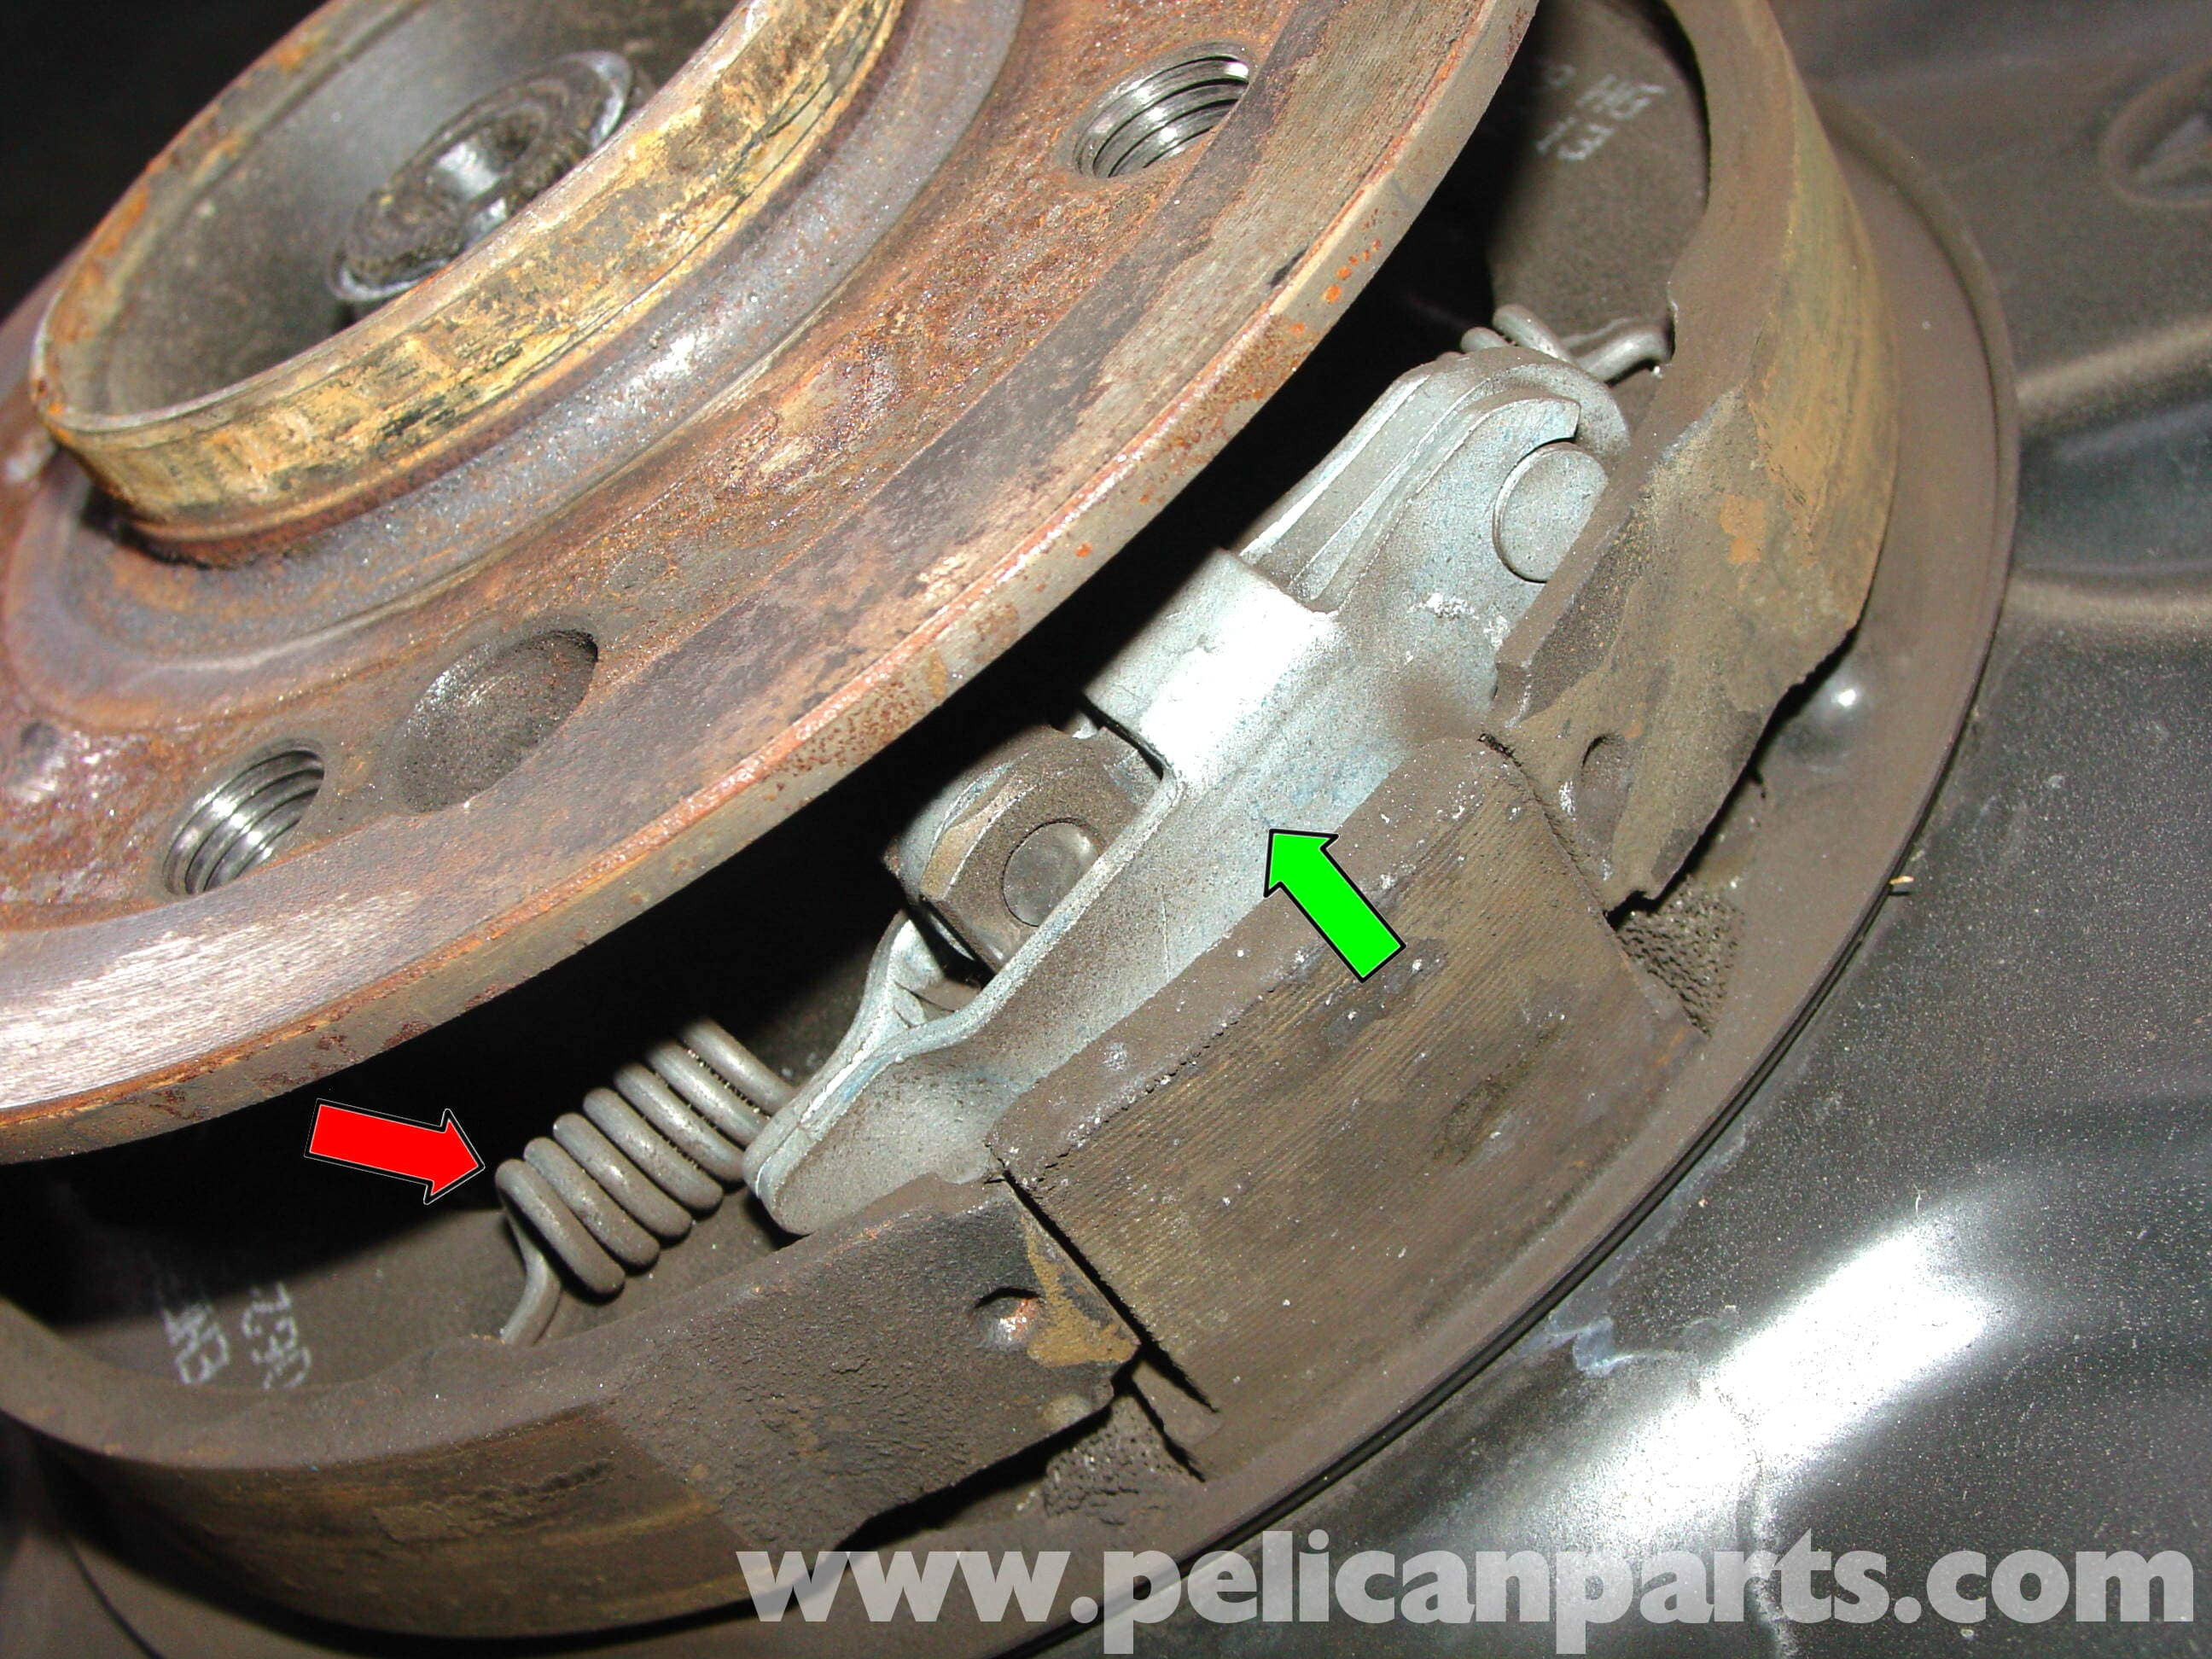 How to adjust handbrake on a 2004 mercedes benz clk class for Parking at mercedes benz superdome